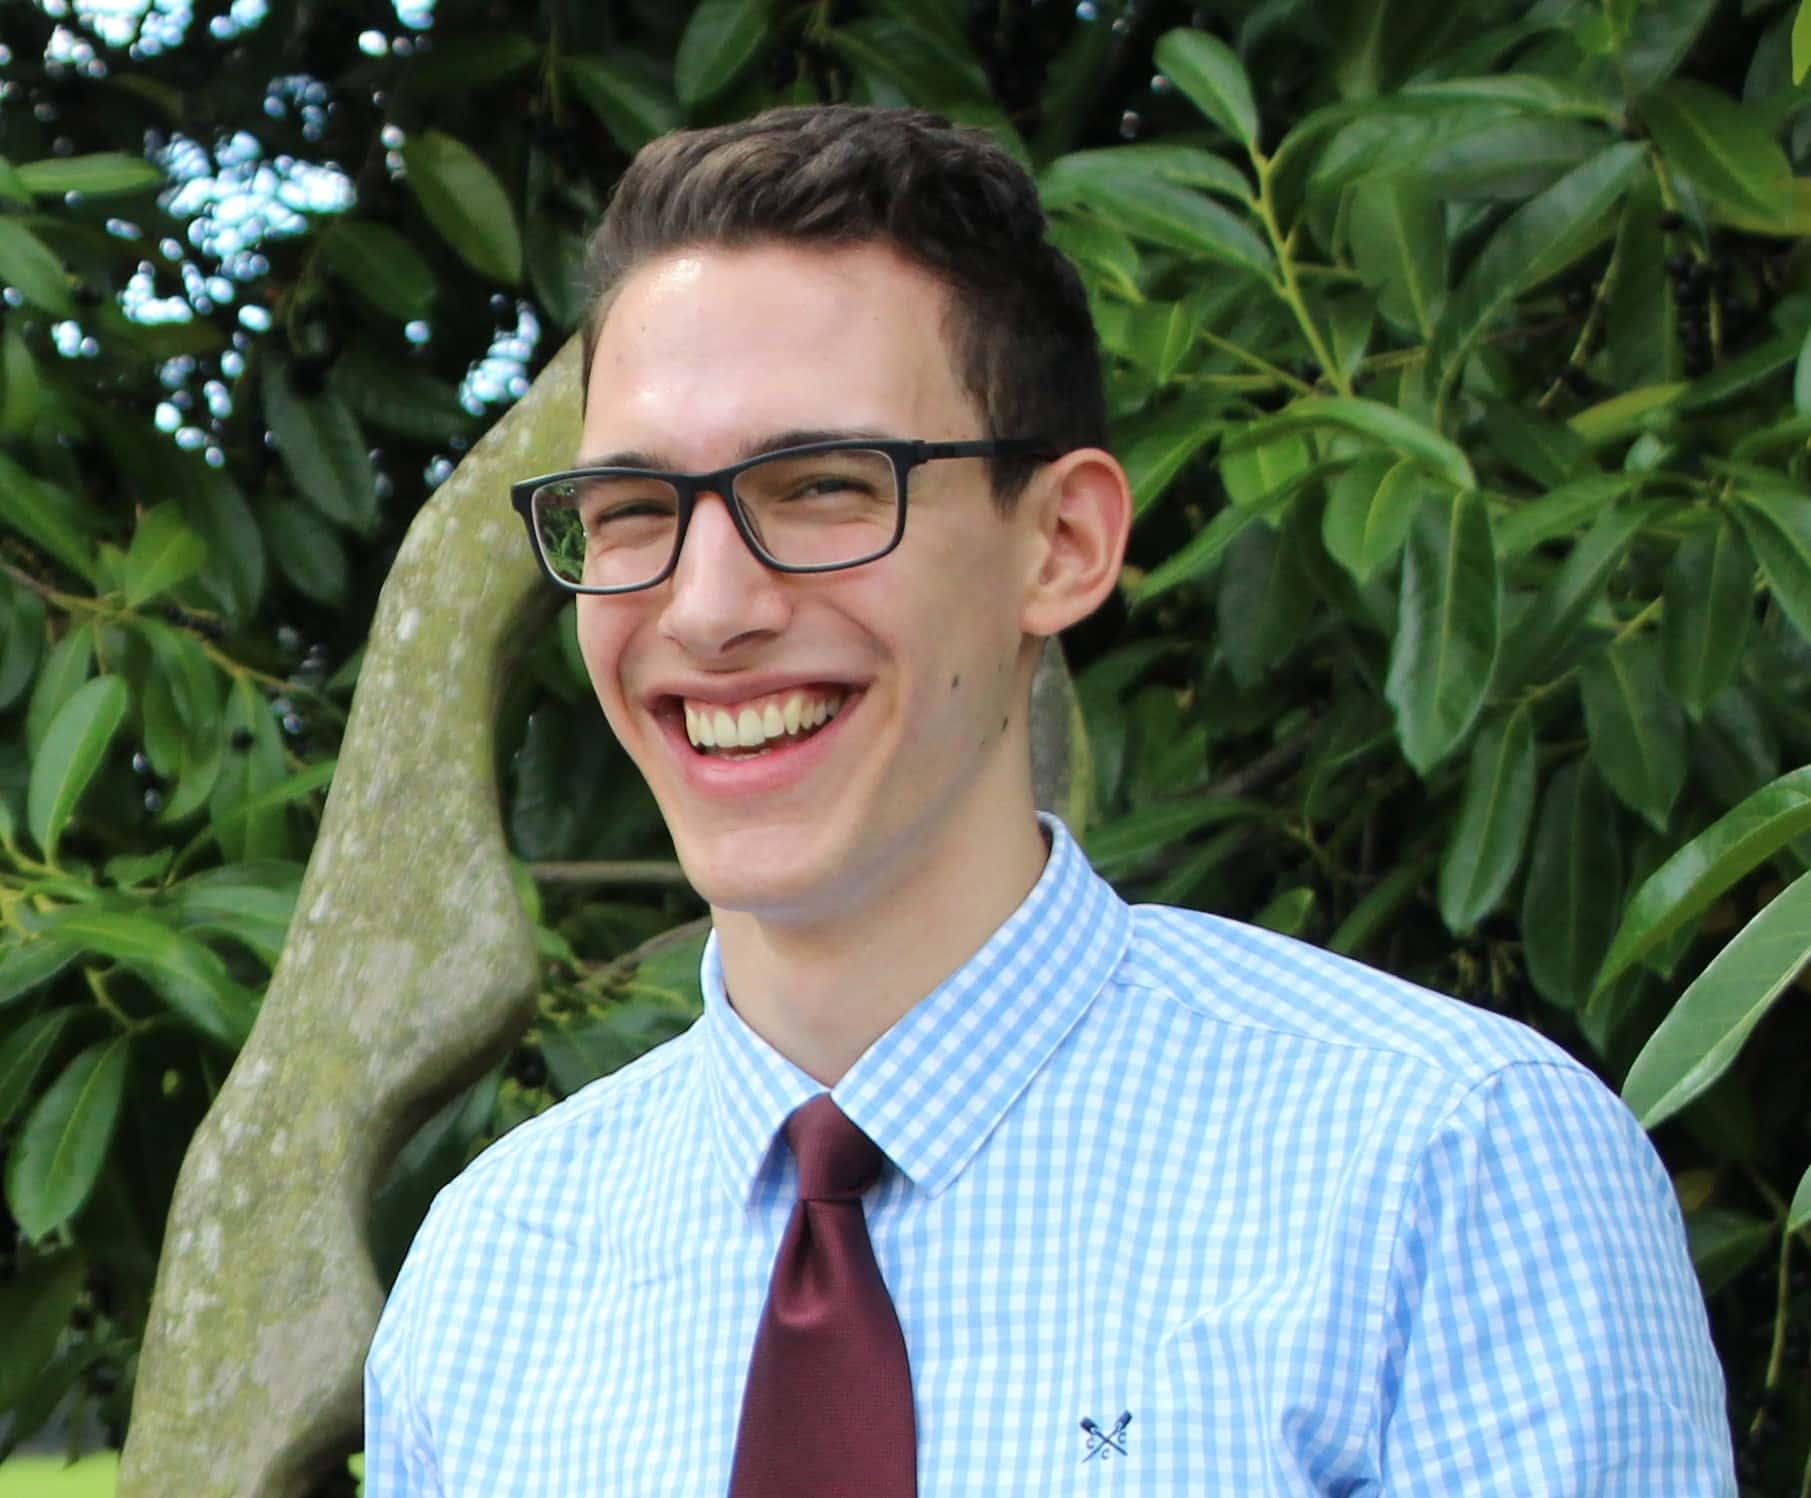 Peter Polz student headshot